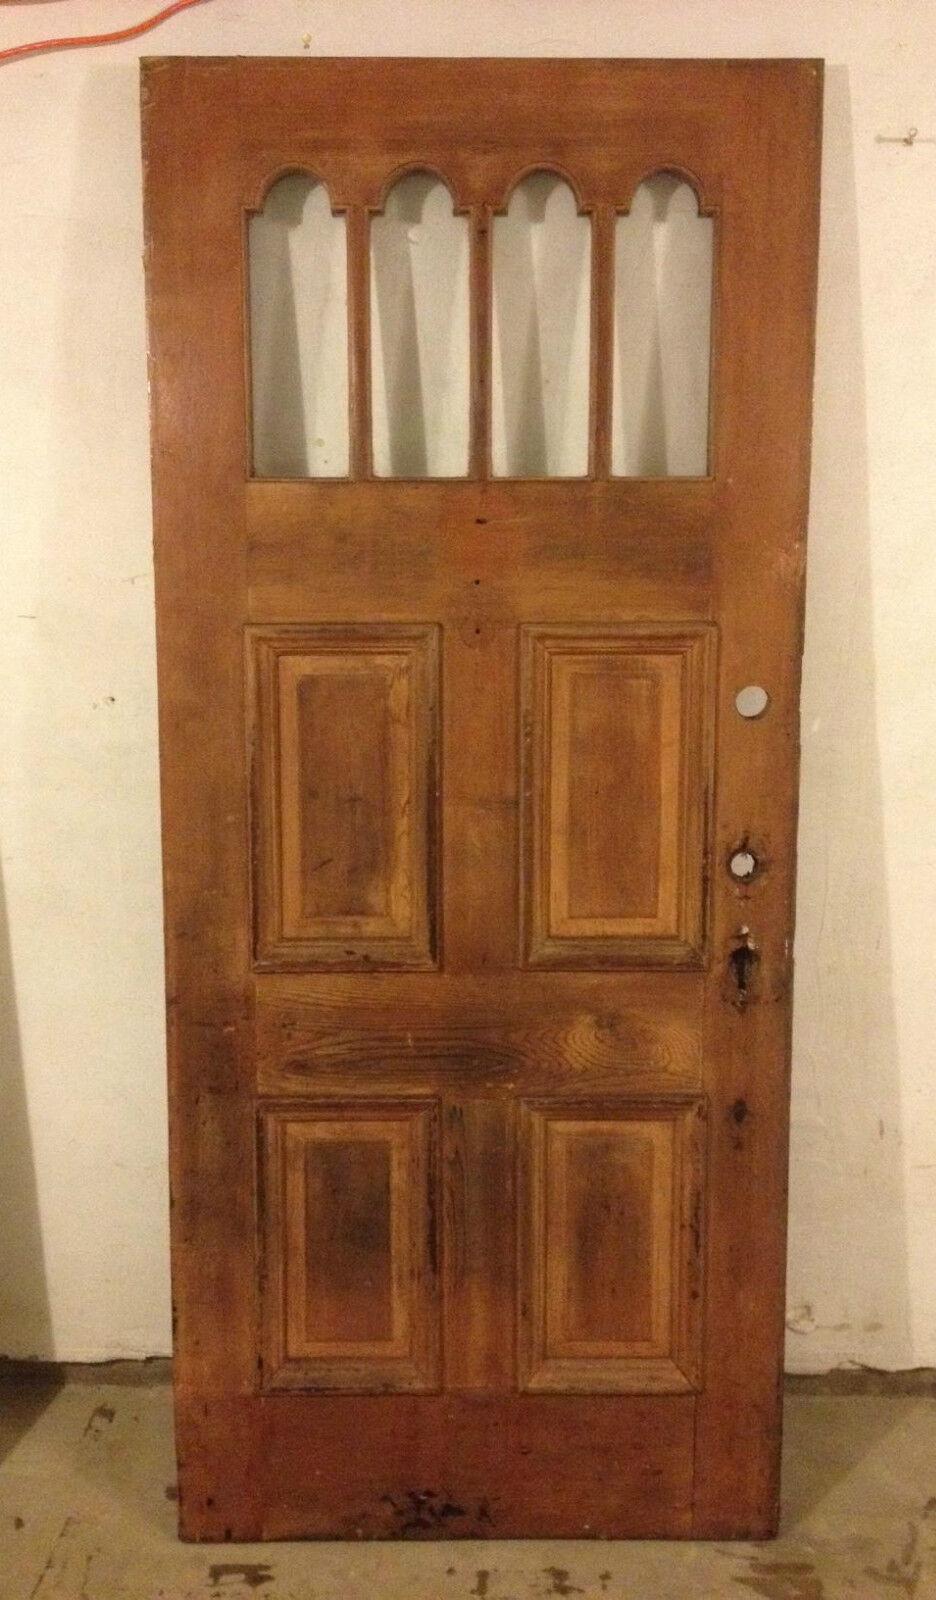 UNIQUE ANTIQUE VICTORIAN WOOD DOOR EXTERIOR /w GLASS 34X79 ARCHITECTURAL SALVAGE